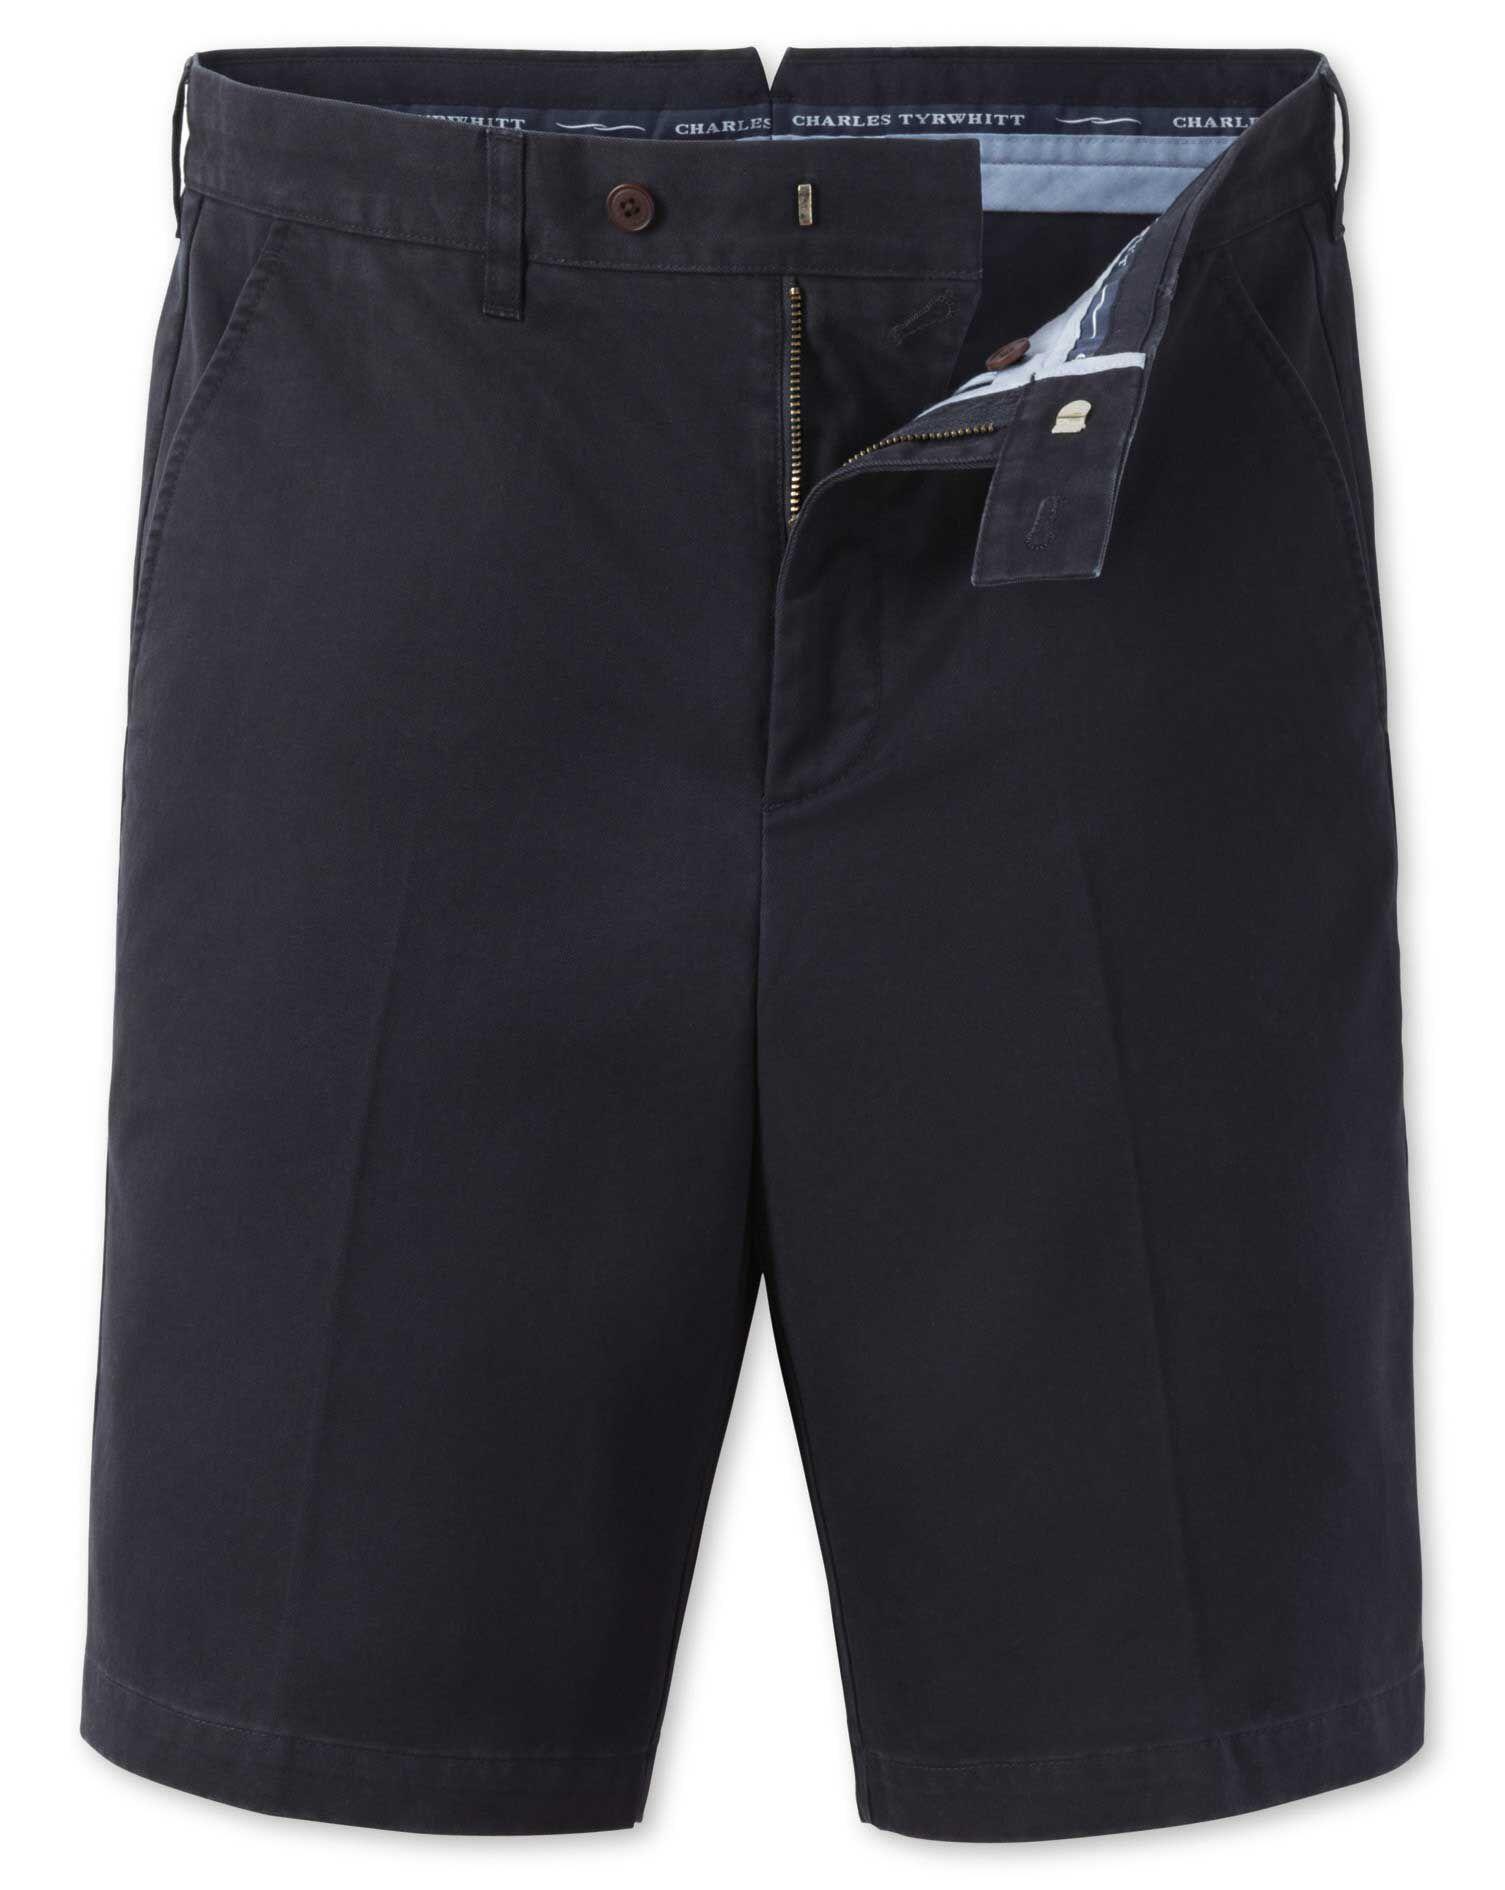 Navy Single Pleat Chino Cotton Shorts Size 30 by Charles Tyrwhitt